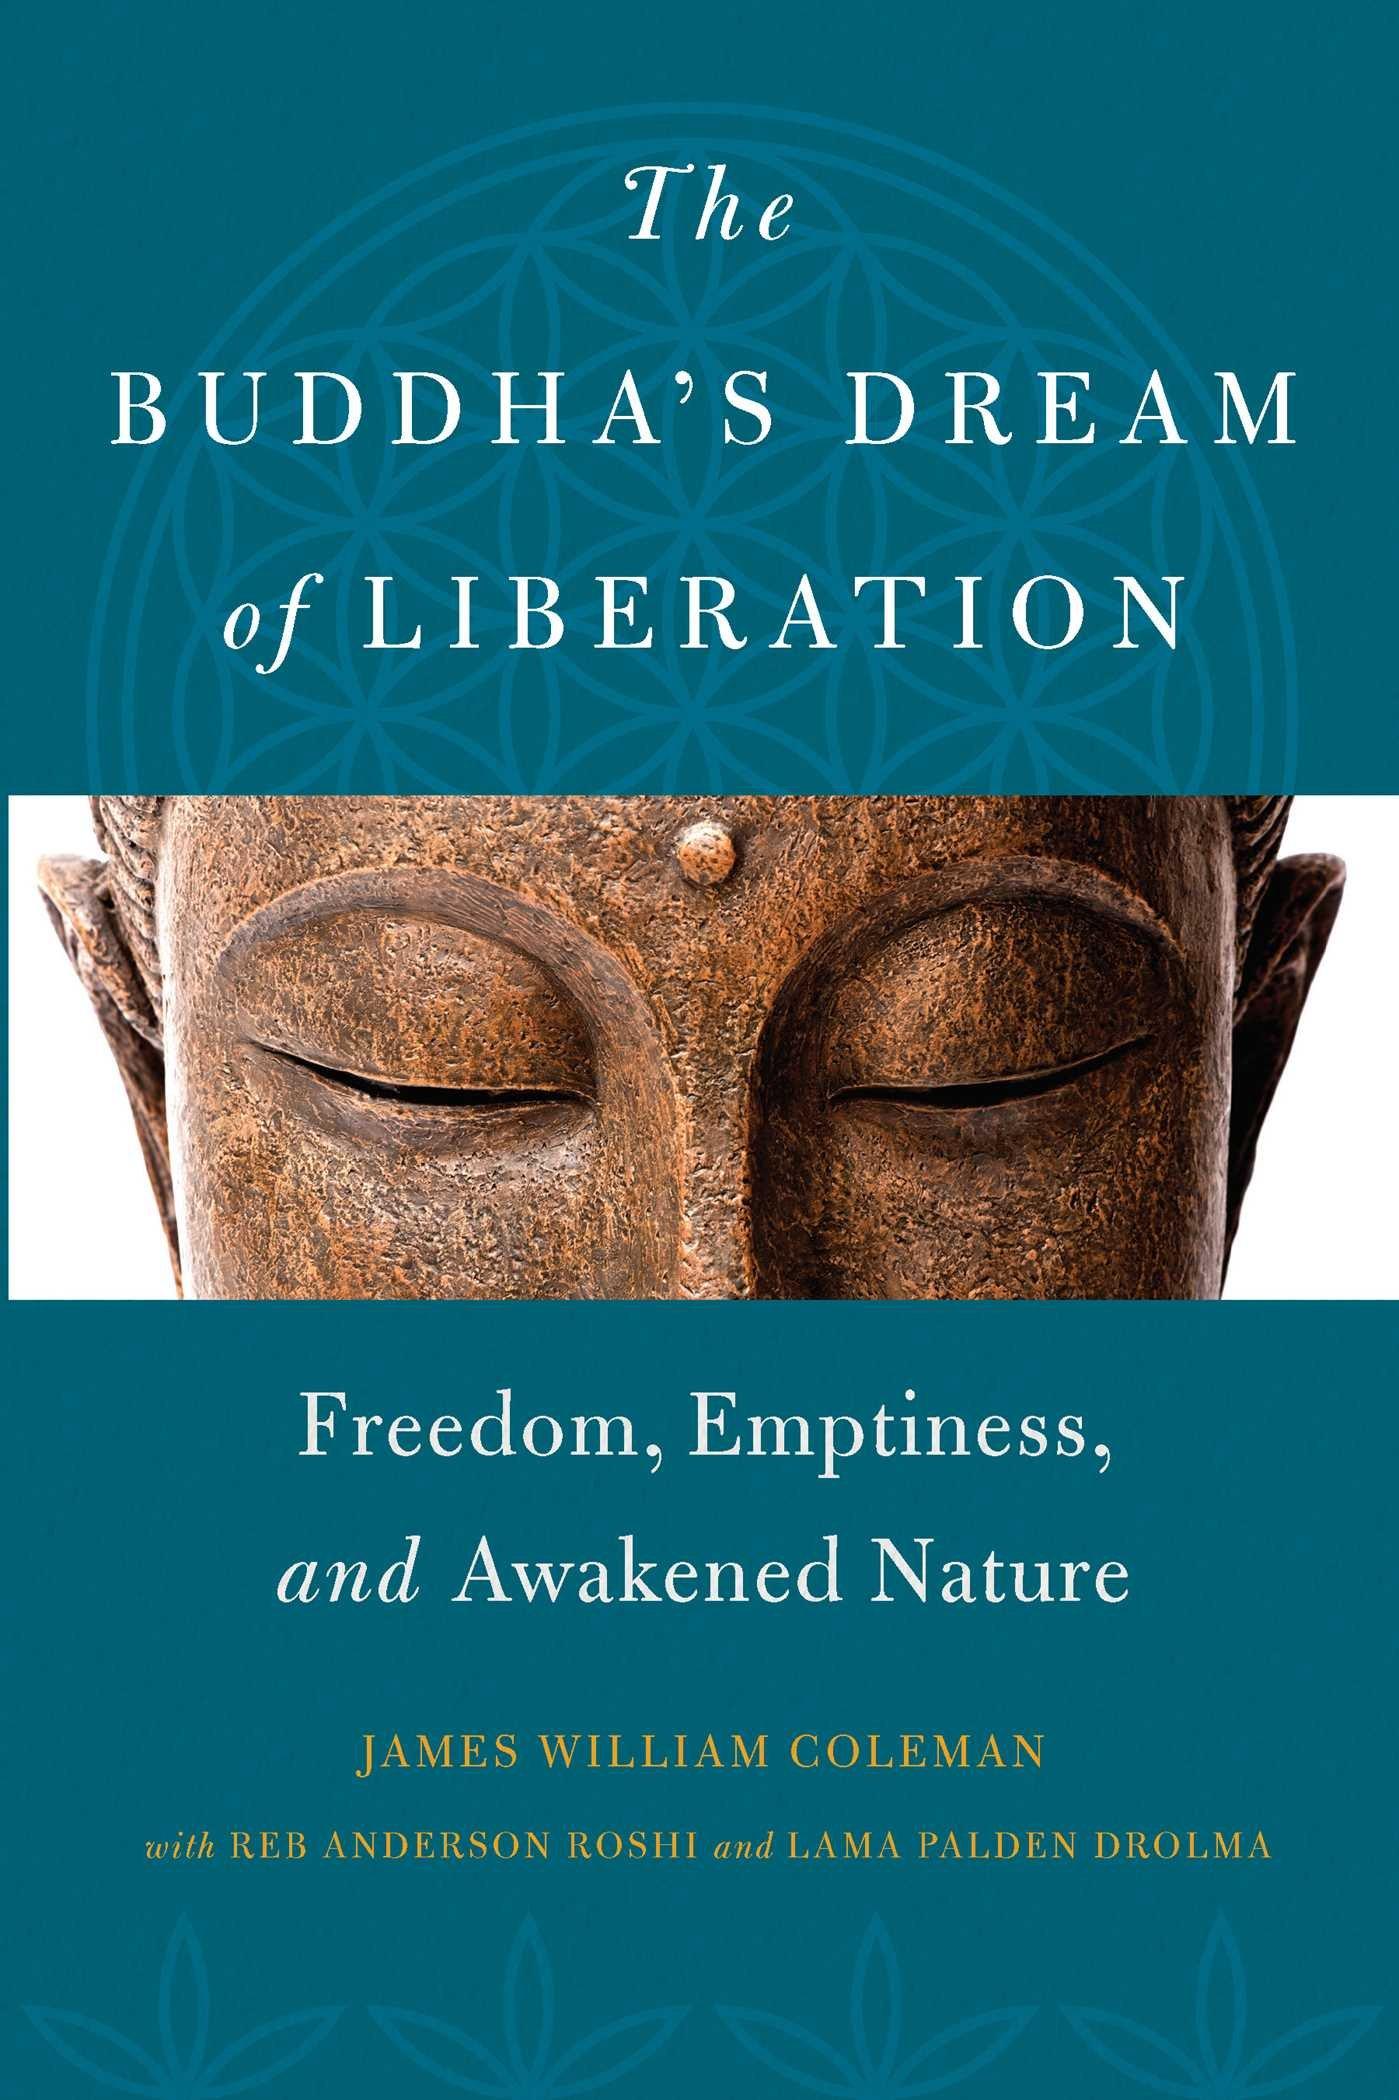 Download The Buddha's Dream of Liberation: Freedom, Emptiness, and Awakened Nature PDF